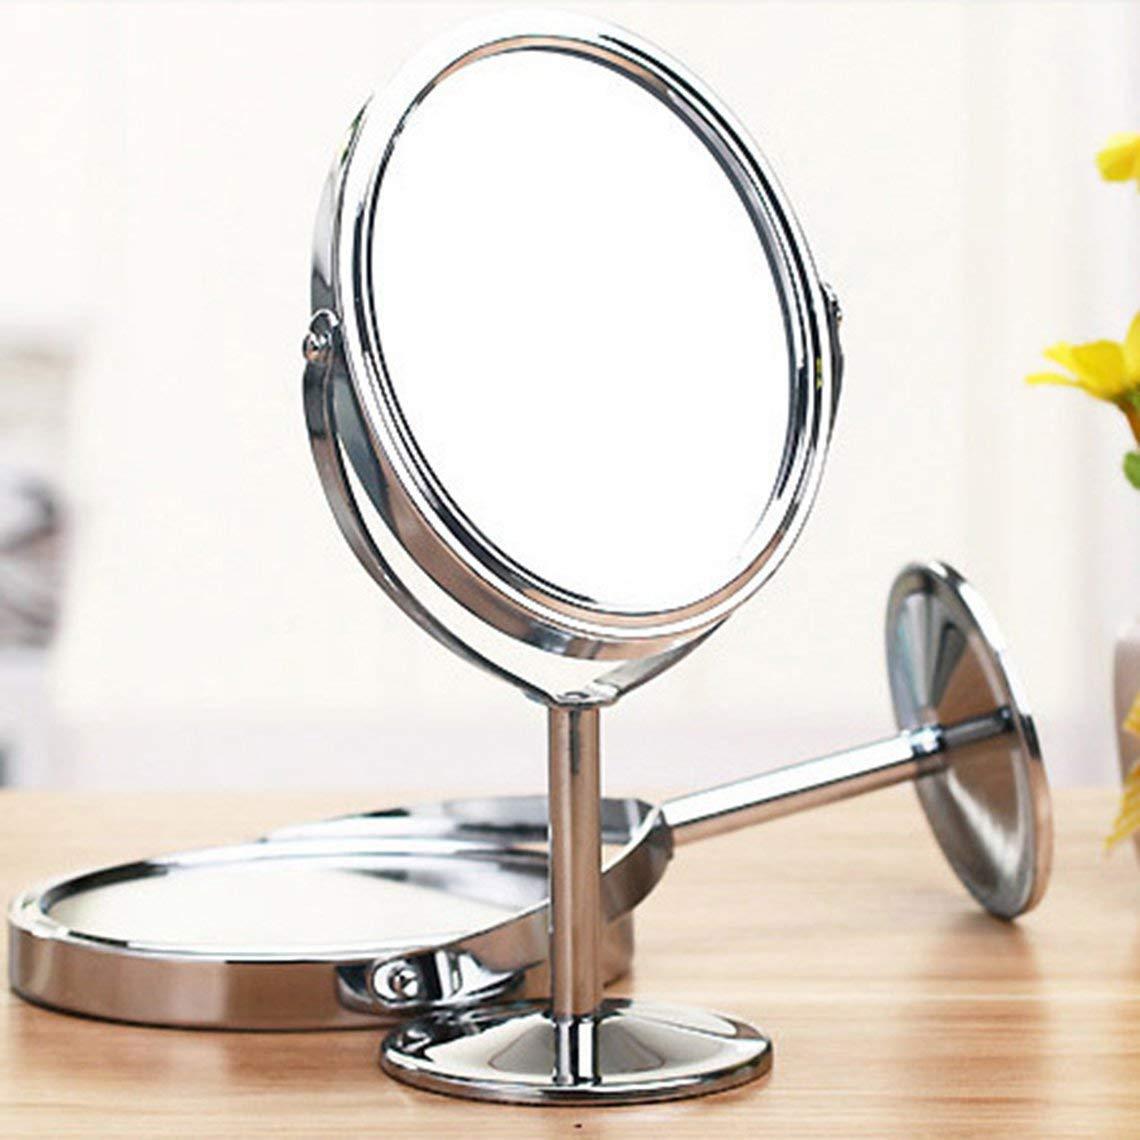 Momorain 828t cor/éen Miroir en m/étal Miroir de Maquillage Dressing Miroir de Bureau Miroir en Rotation 1 2 Fonction de grossissement Miroir de Maquillage